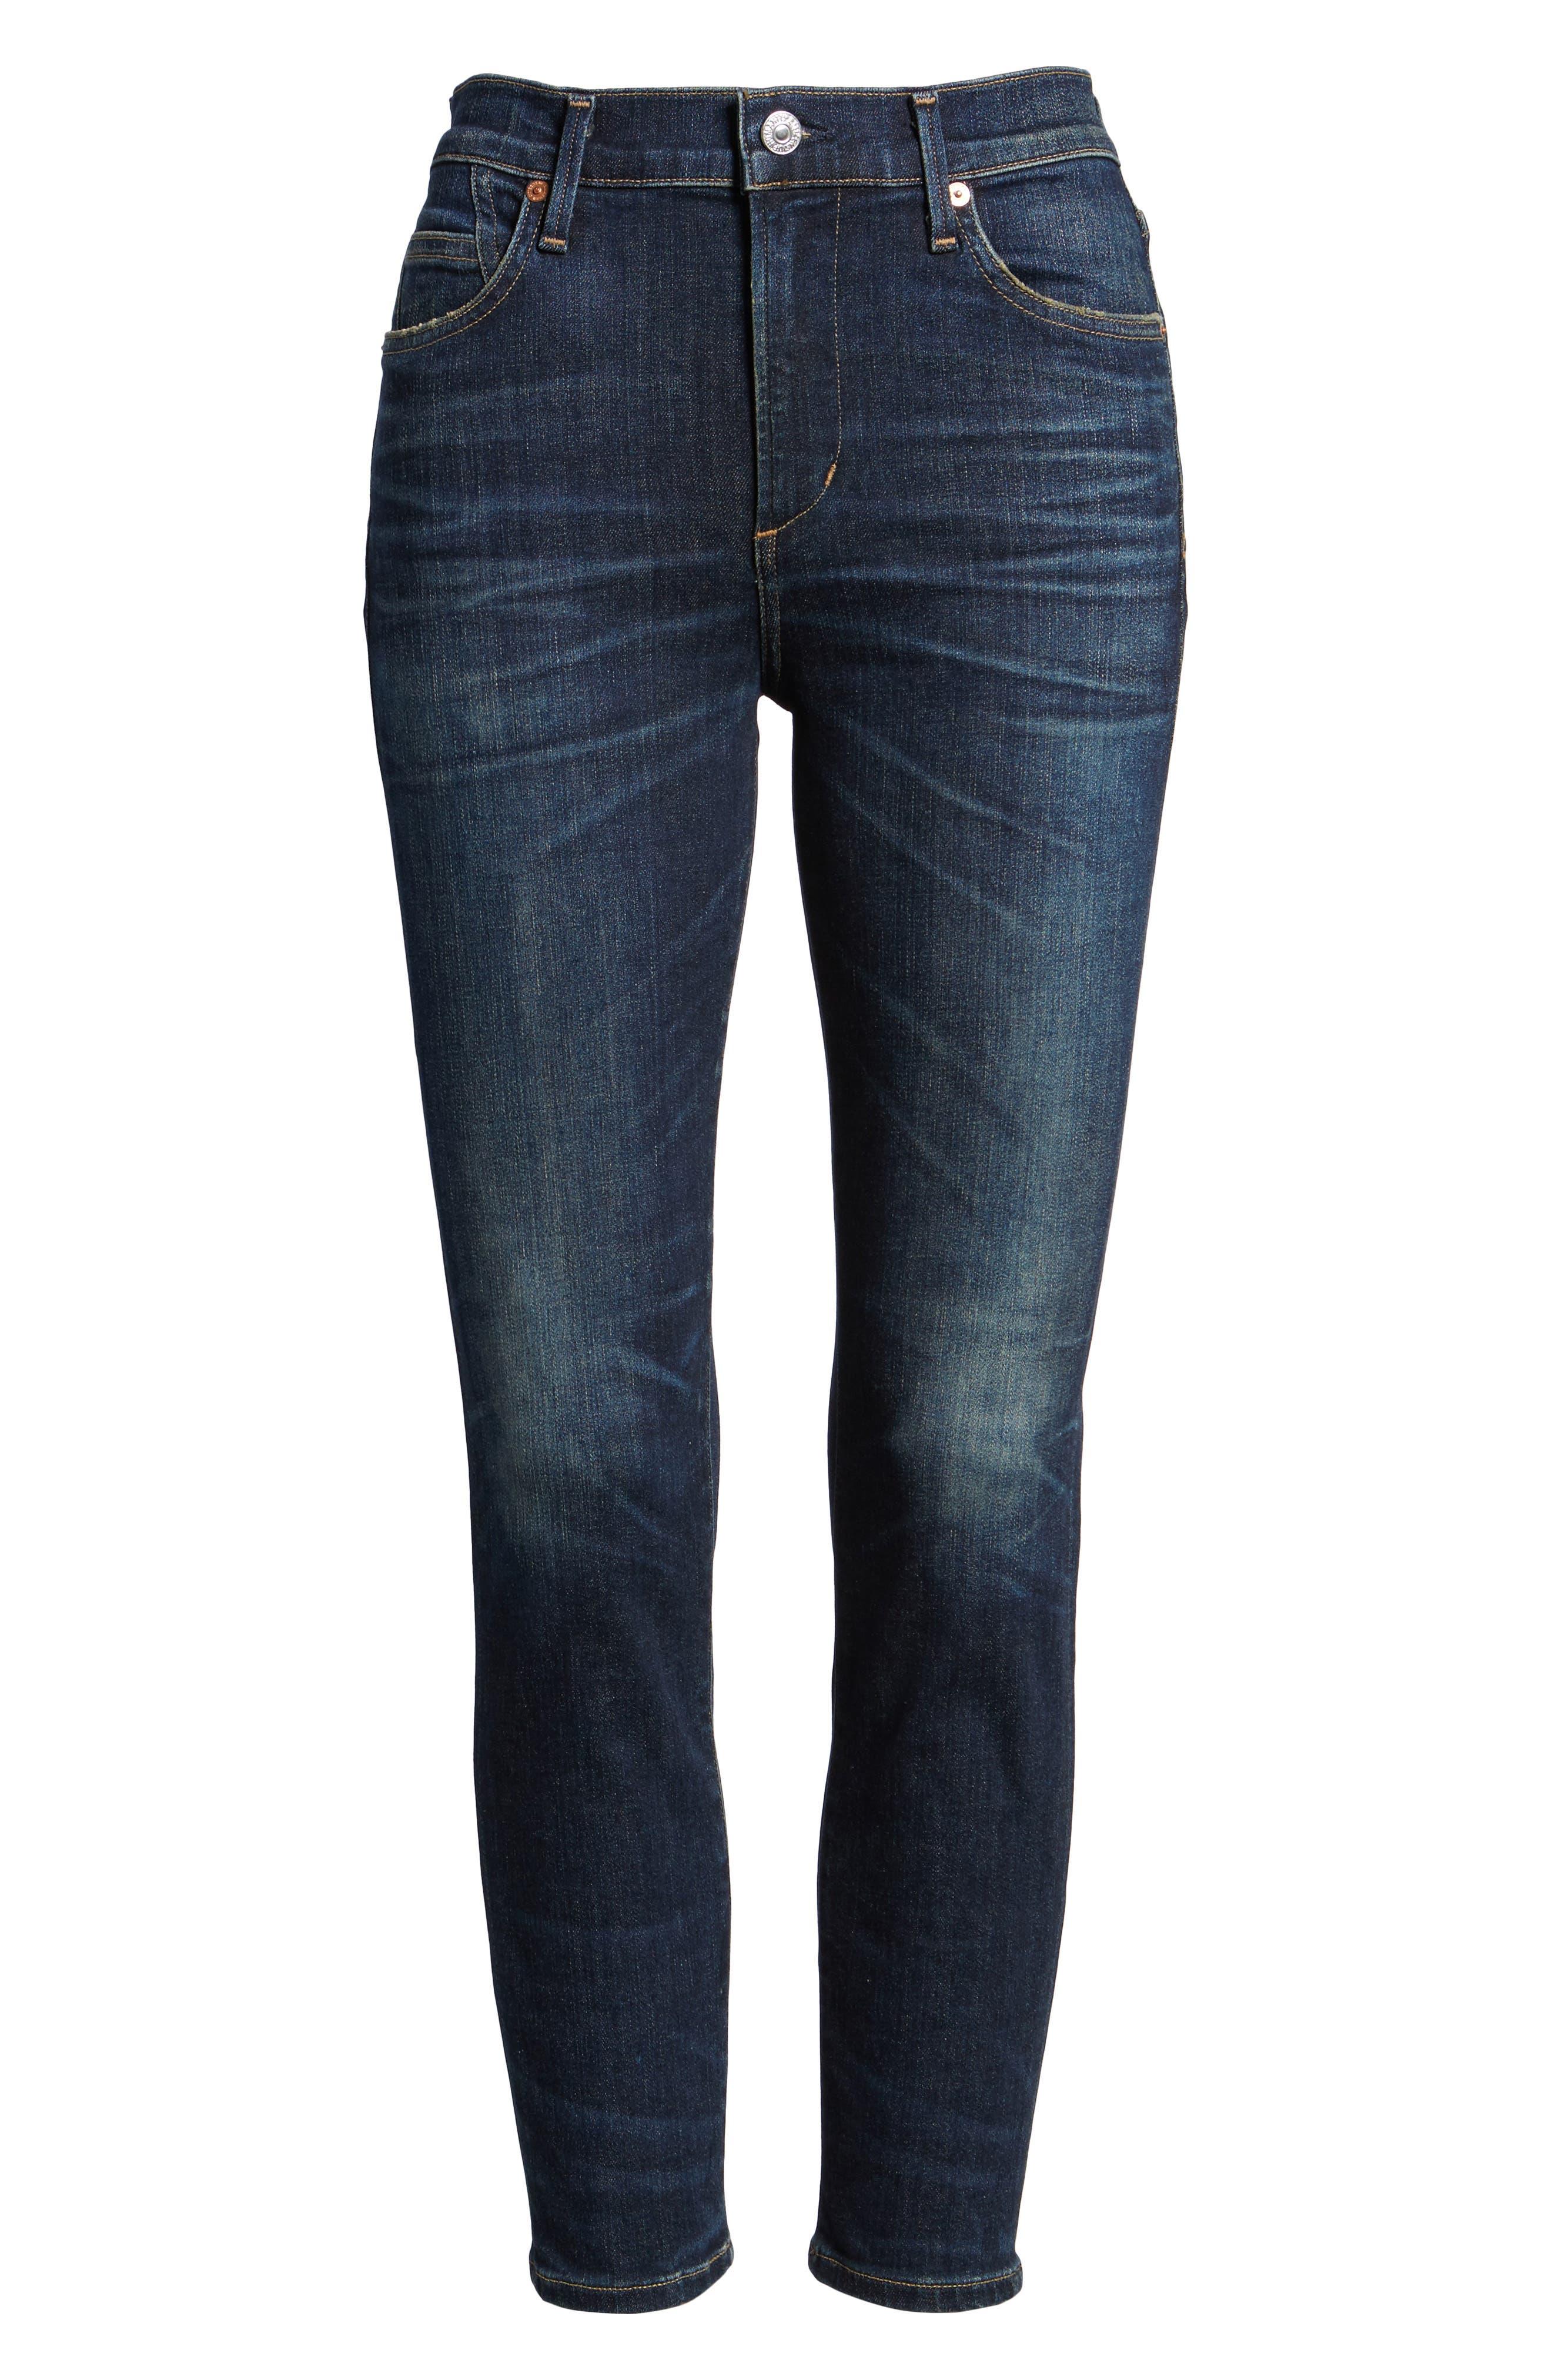 Rocket High Waist Crop Skinny Jeans,                         Main,                         color, 410